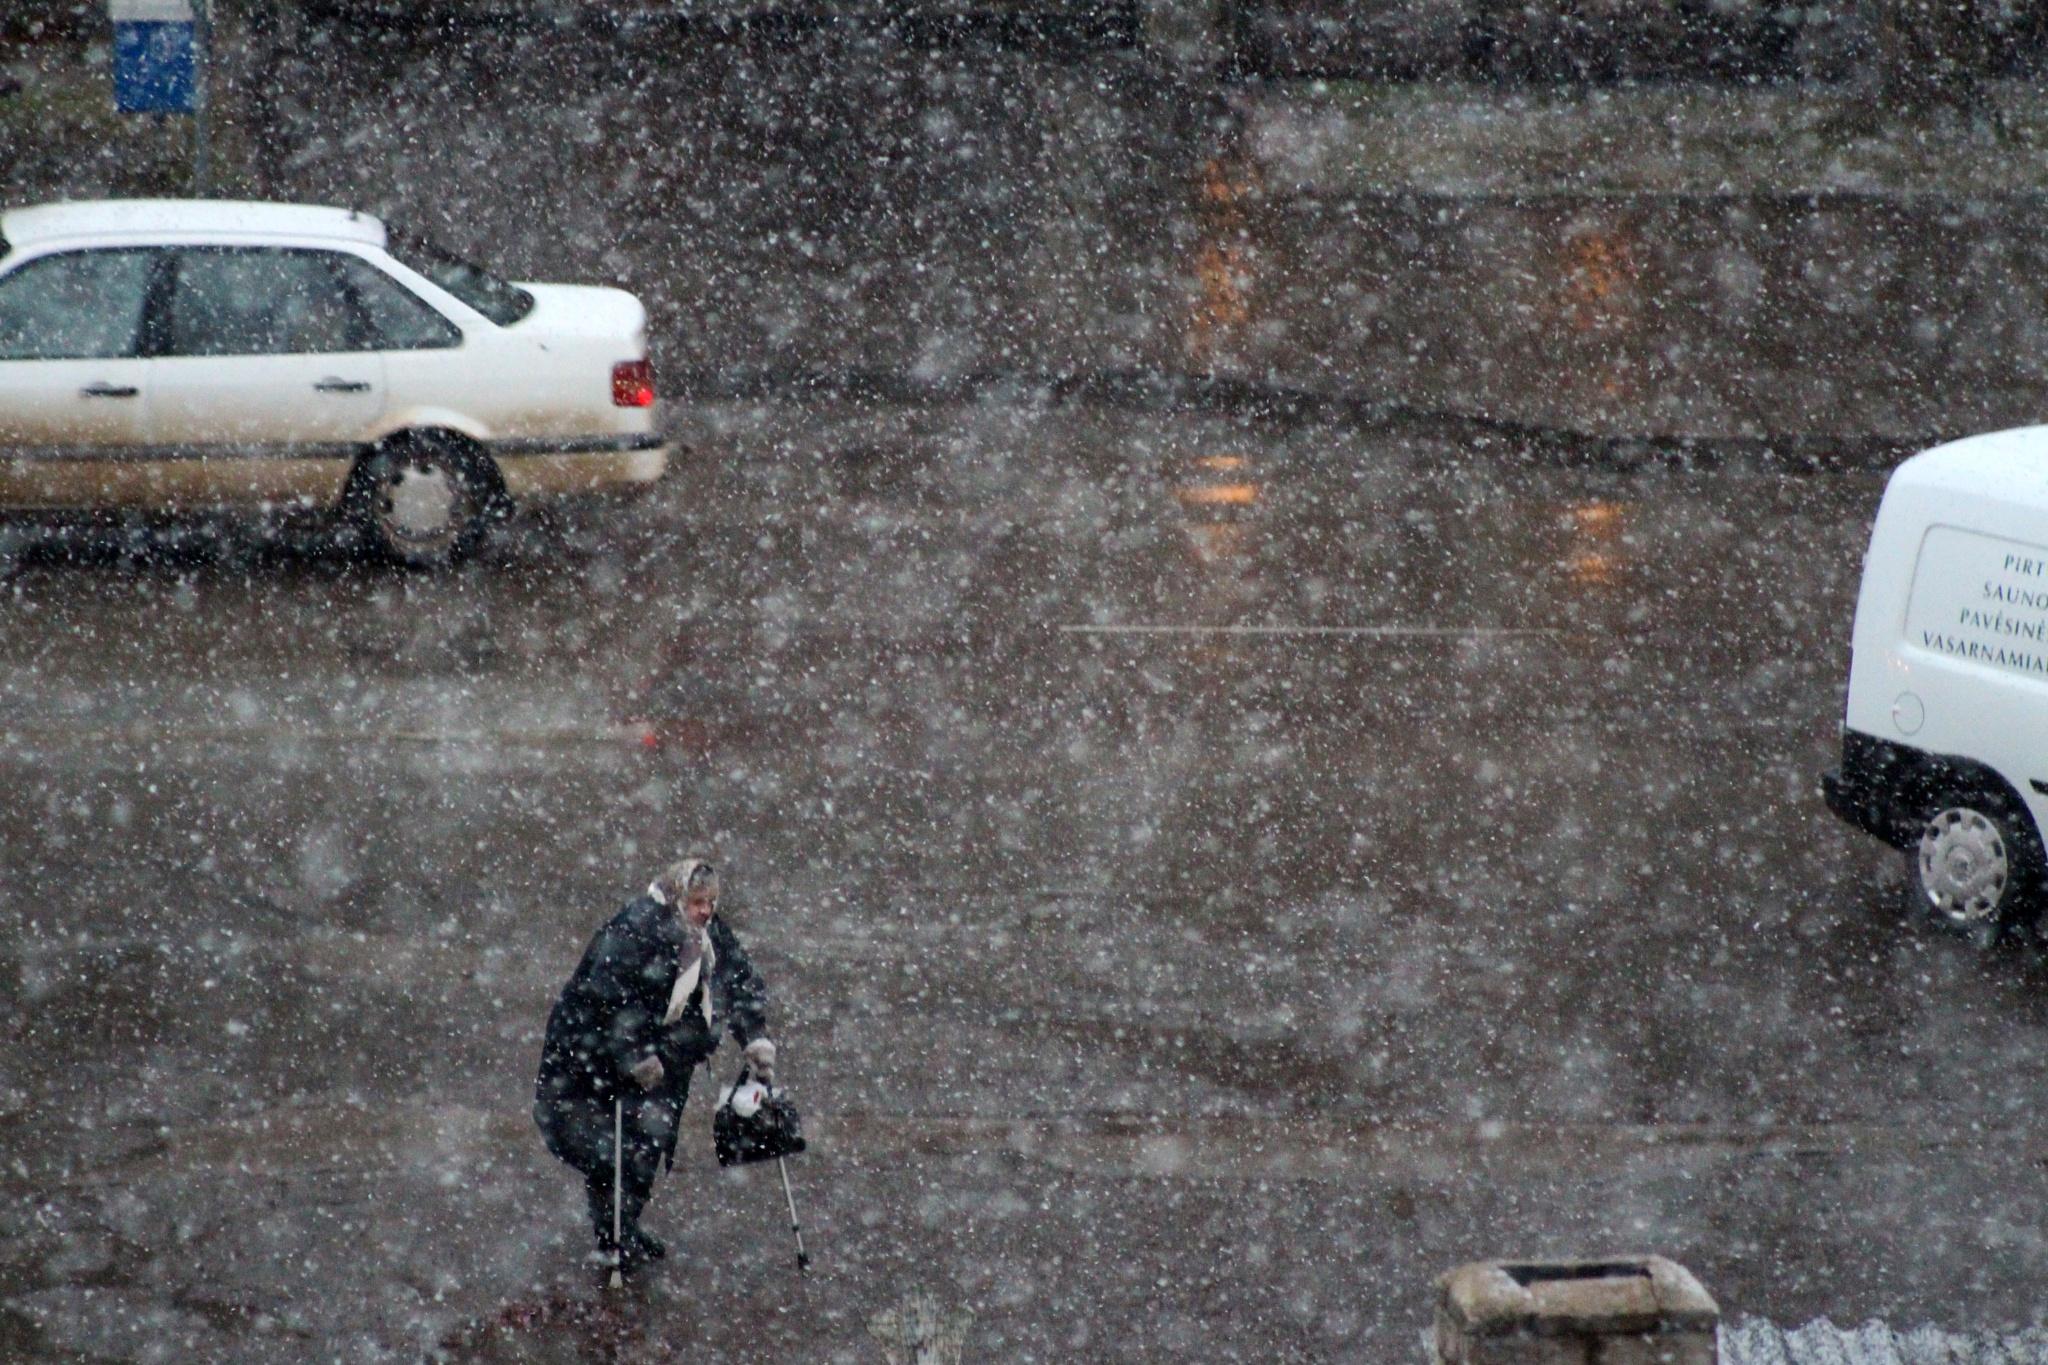 Oh, how long ago it was snowing ...(3) by Zenonas Meškauskas